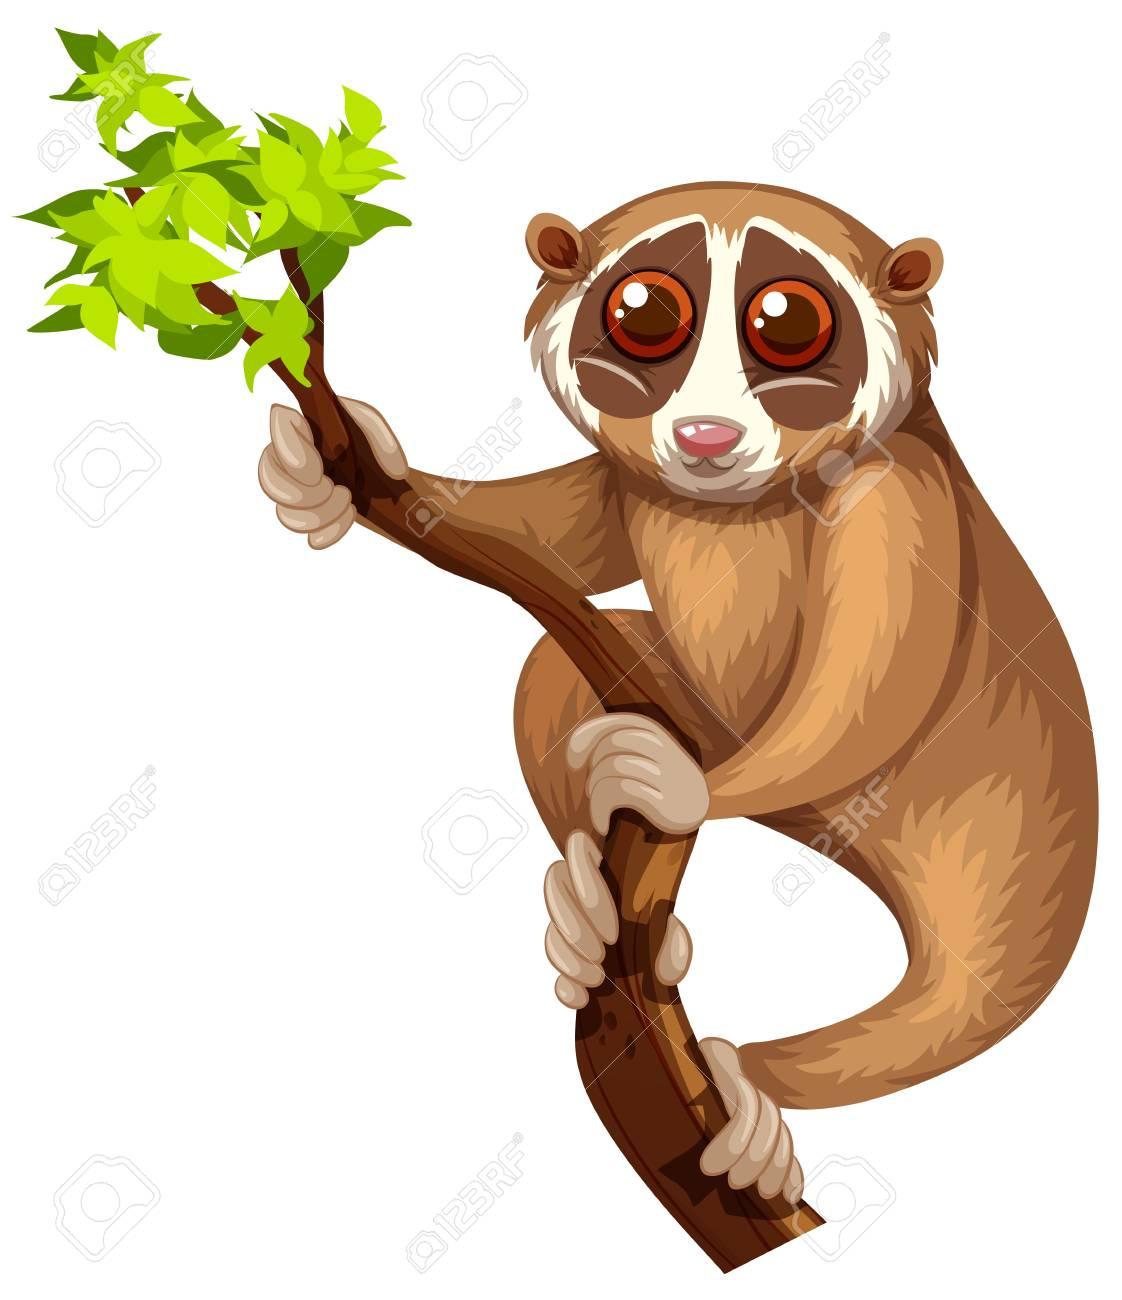 Wild loris on the branch illustration - 53746052